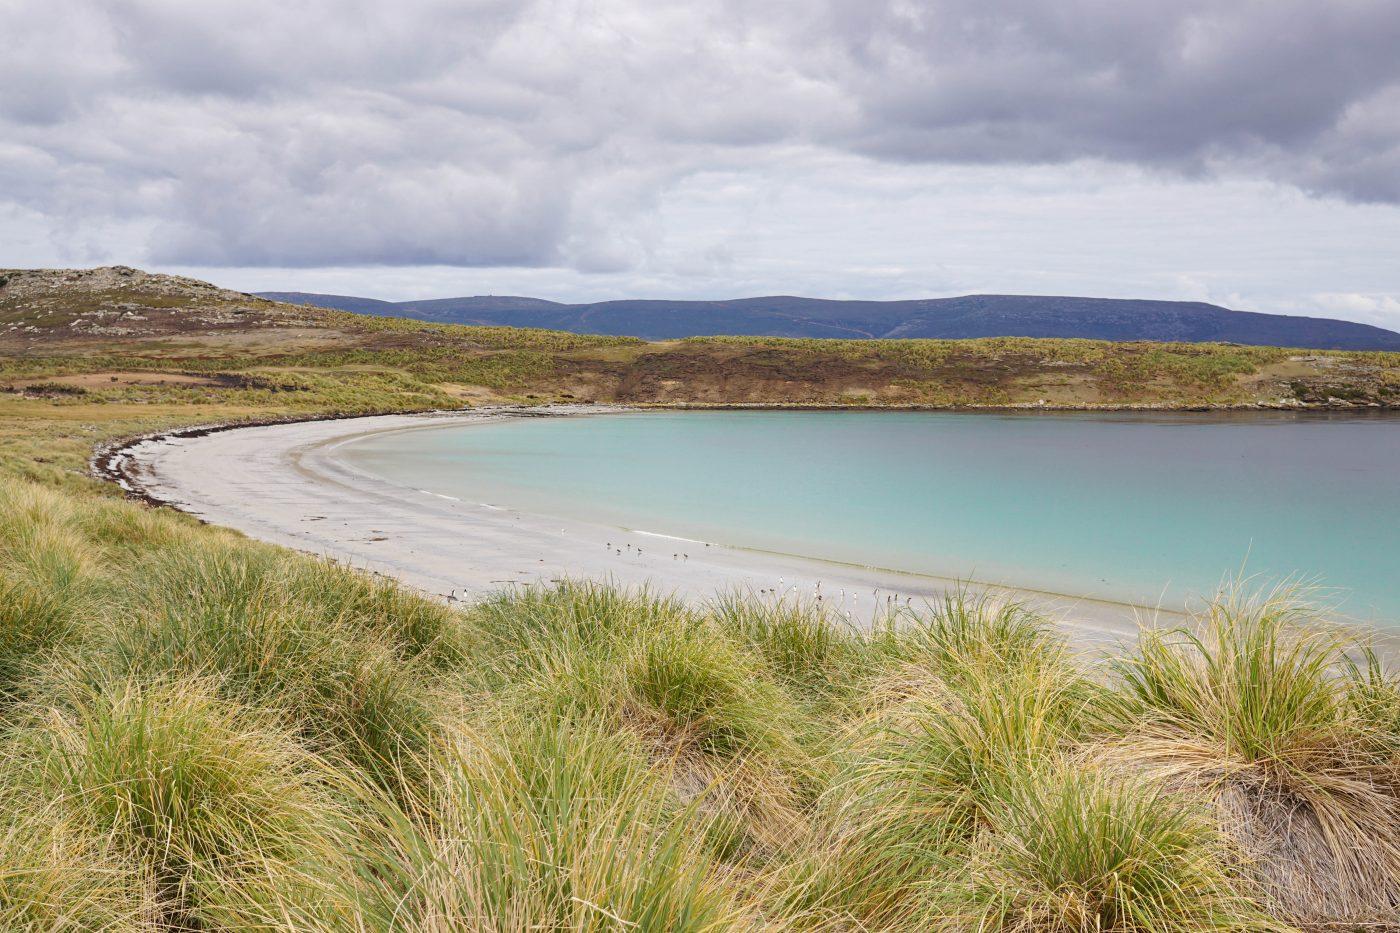 Hiking the Falkland Islands